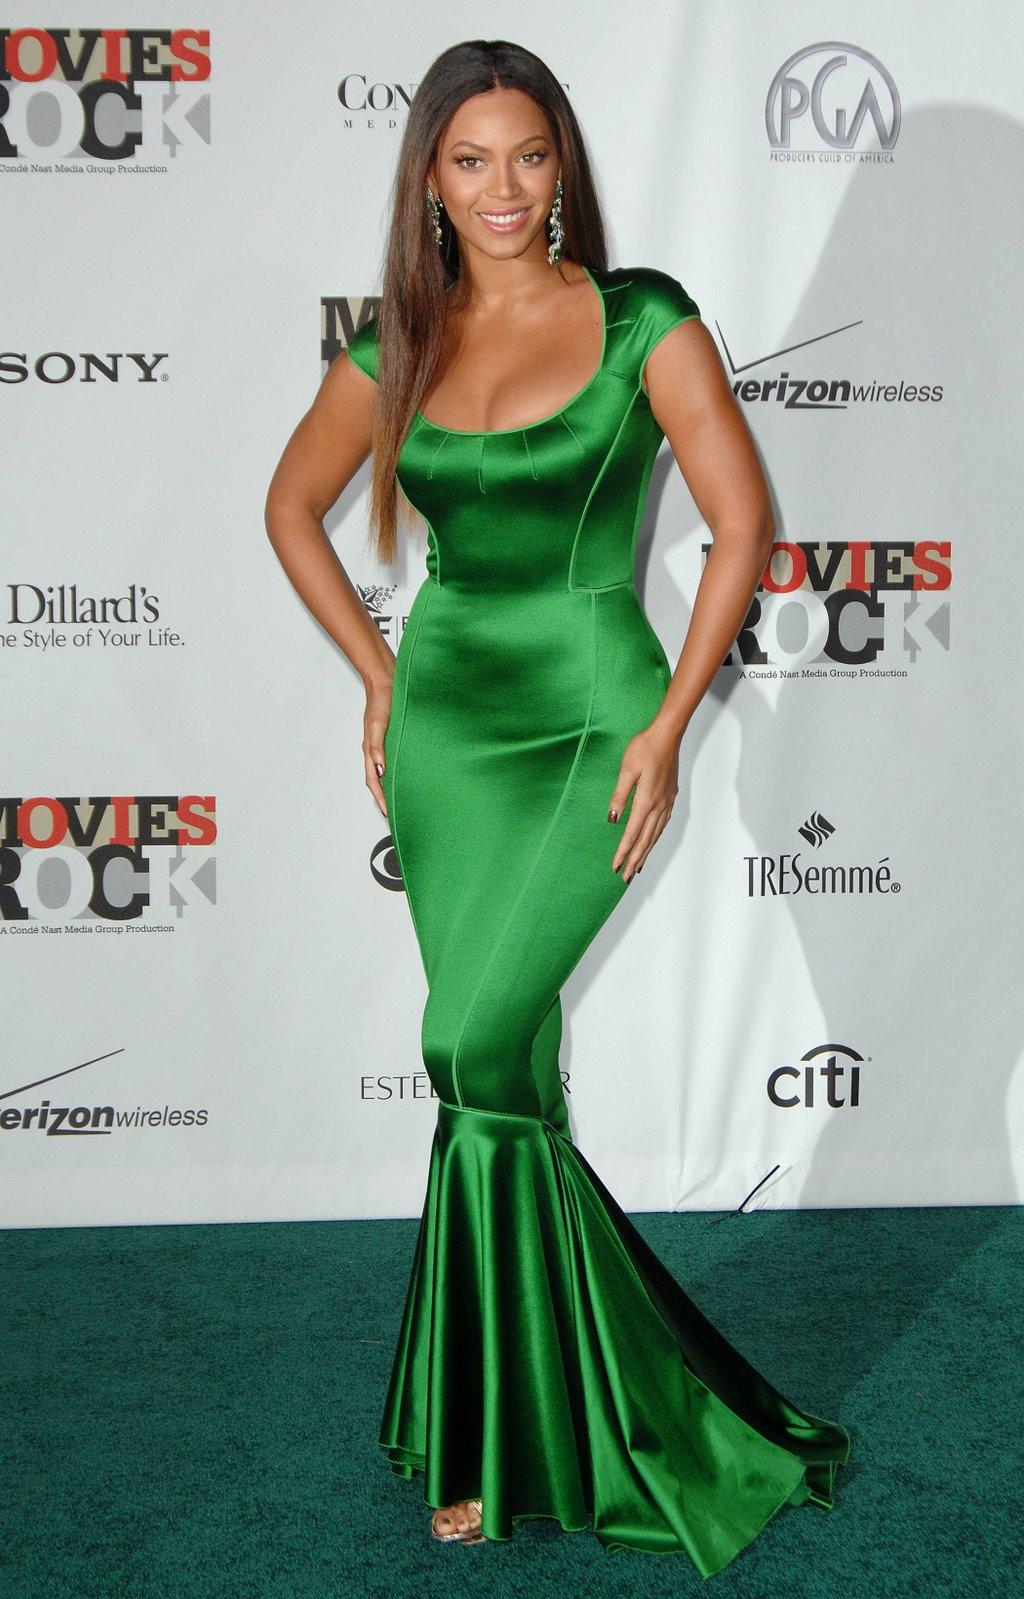 http://1.bp.blogspot.com/-dwmZXiHS2ao/T-66MZ209SI/AAAAAAAAAvA/DFJUJ5l1rU0/s1600/celebutopia_Beyonce_Knowles_-_Movies_Rock_021207_01.jpg